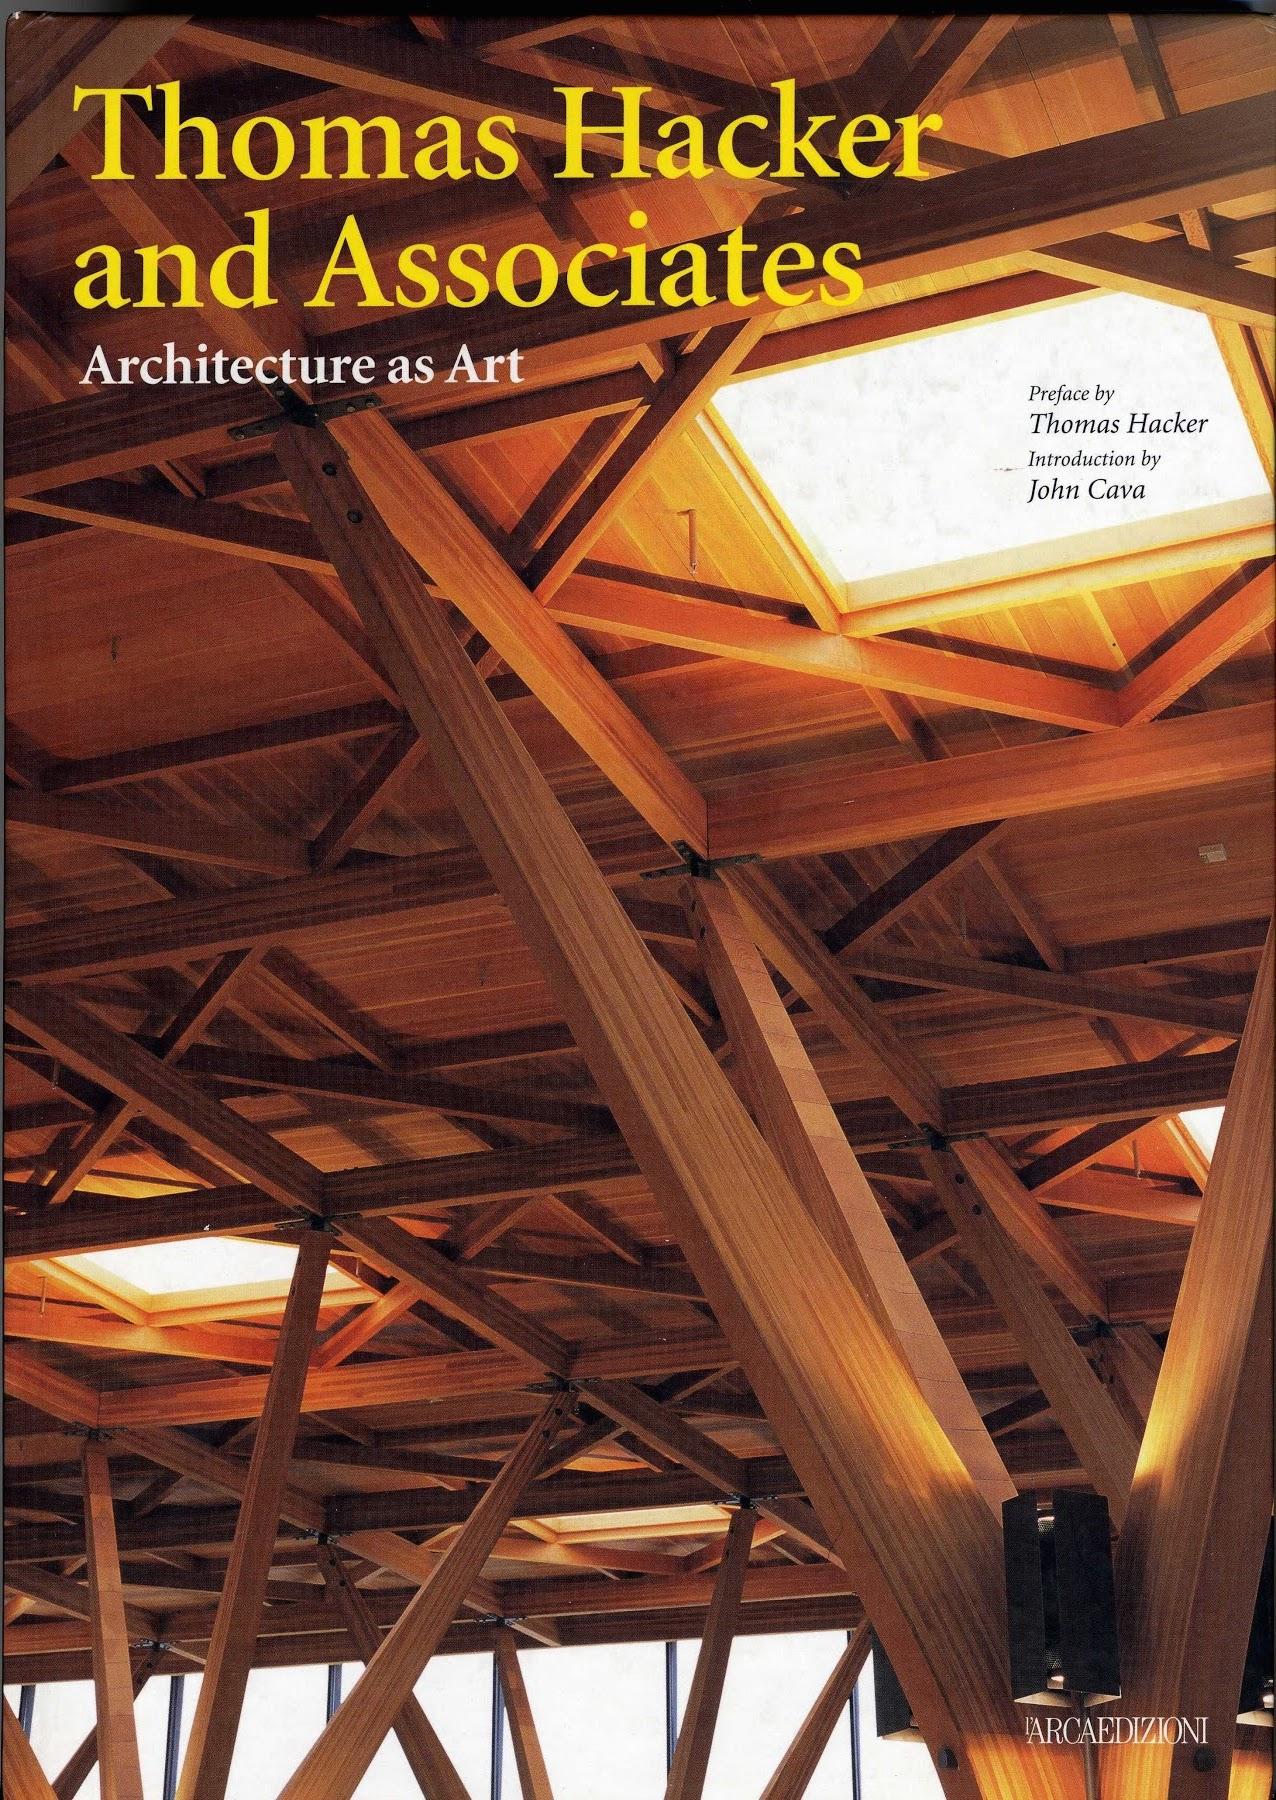 Copy of JCA Publications THA001.jpg